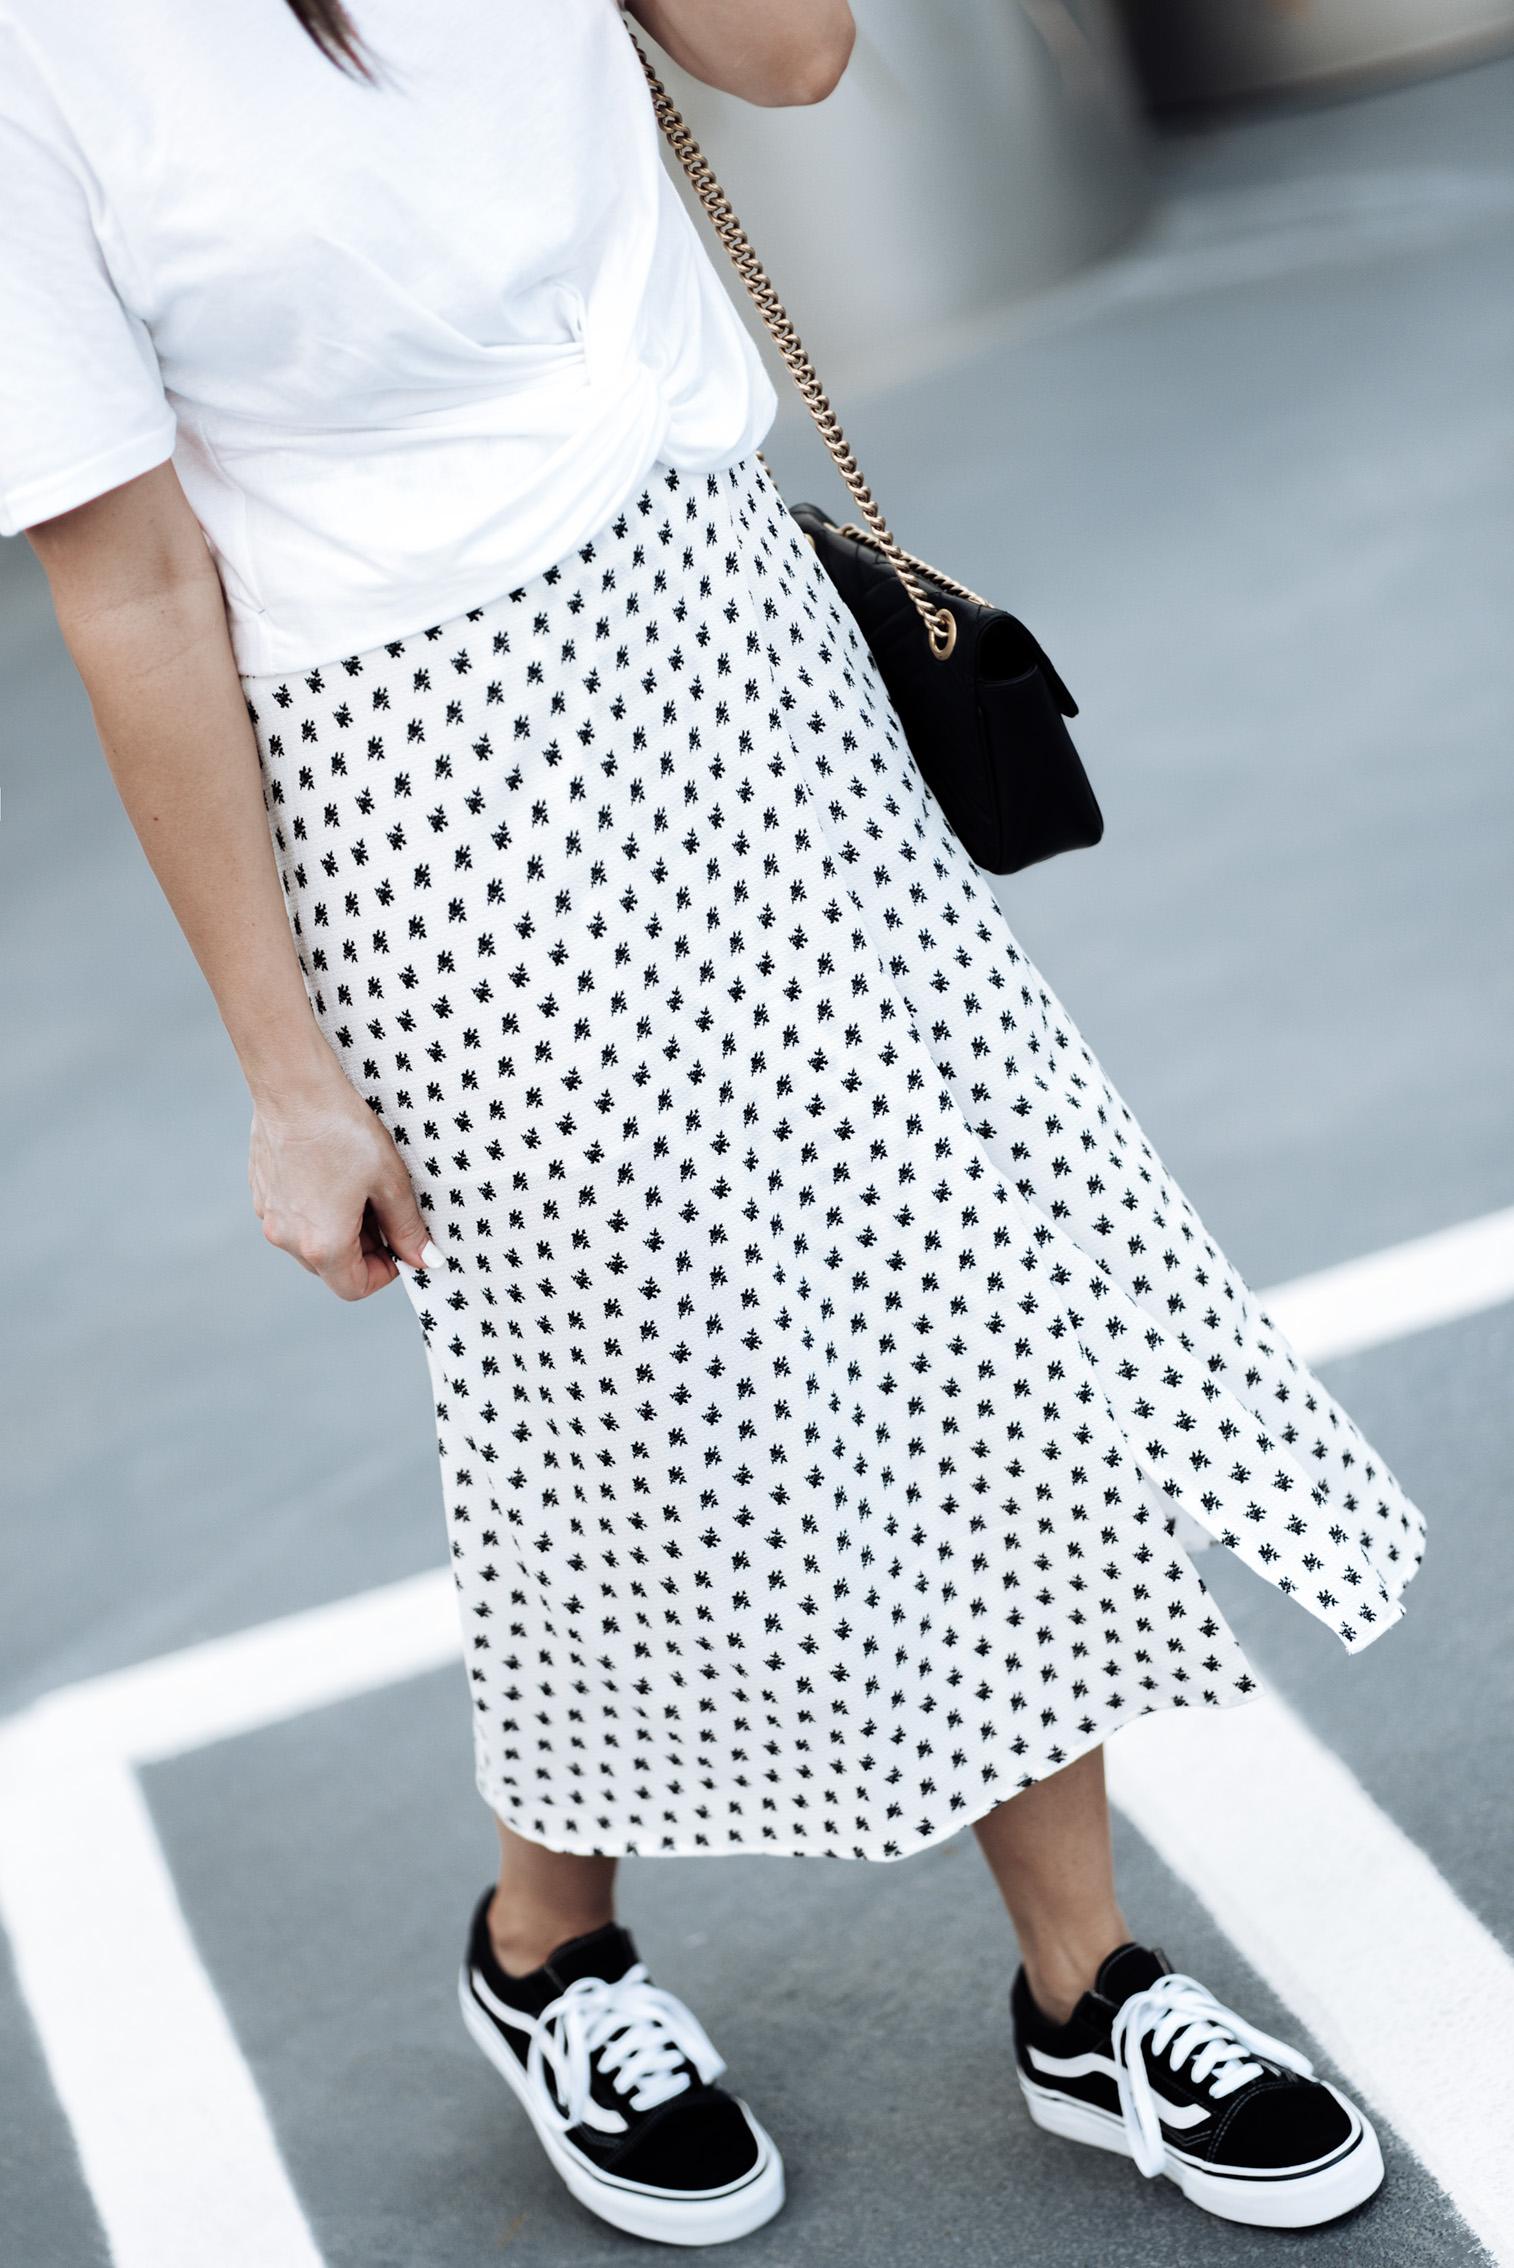 Tiffany Jais Houston fashion and lifestyle blogger | Wrap midi skirt trend | Side Party wrap midi skirt (Size small) | Twist front tee | Gucci Marmont bag | Vans Originals | Mini Marie Pendant |